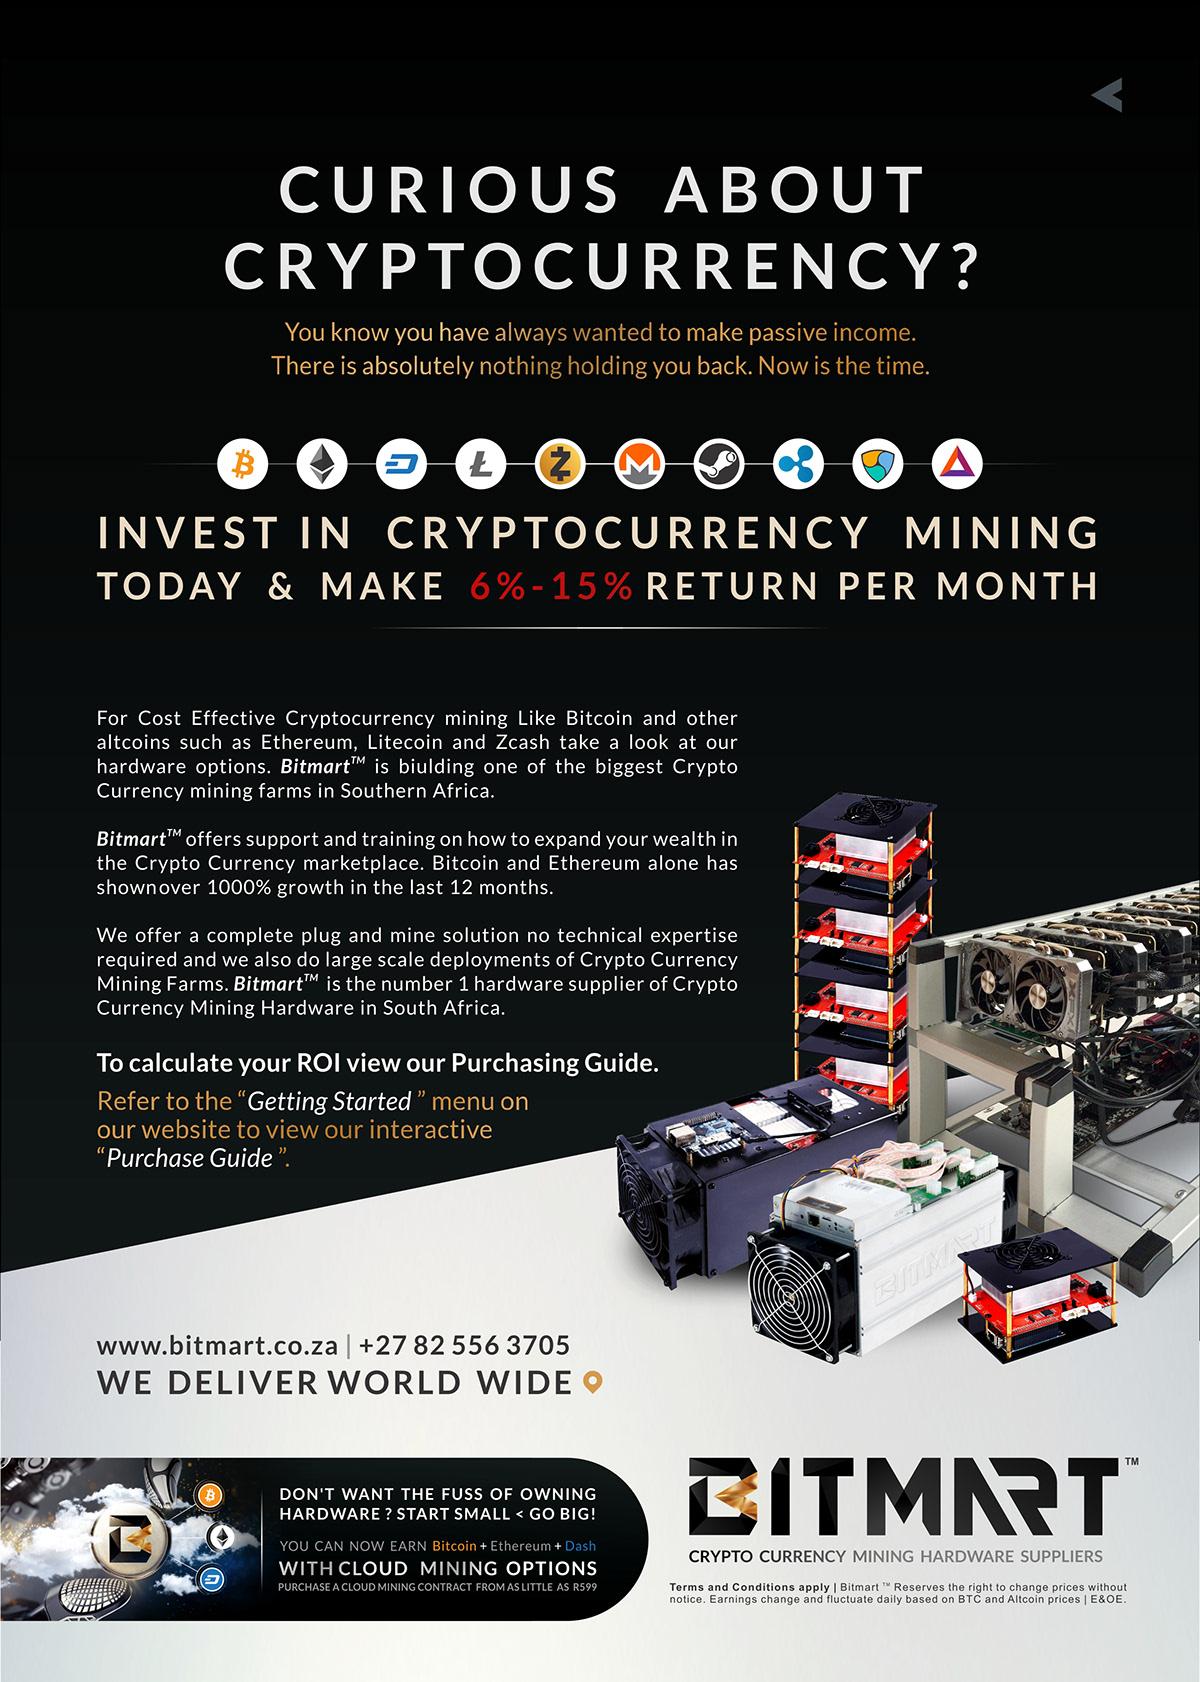 Bitmart | Crypto Currency Mining Hardware on Behance